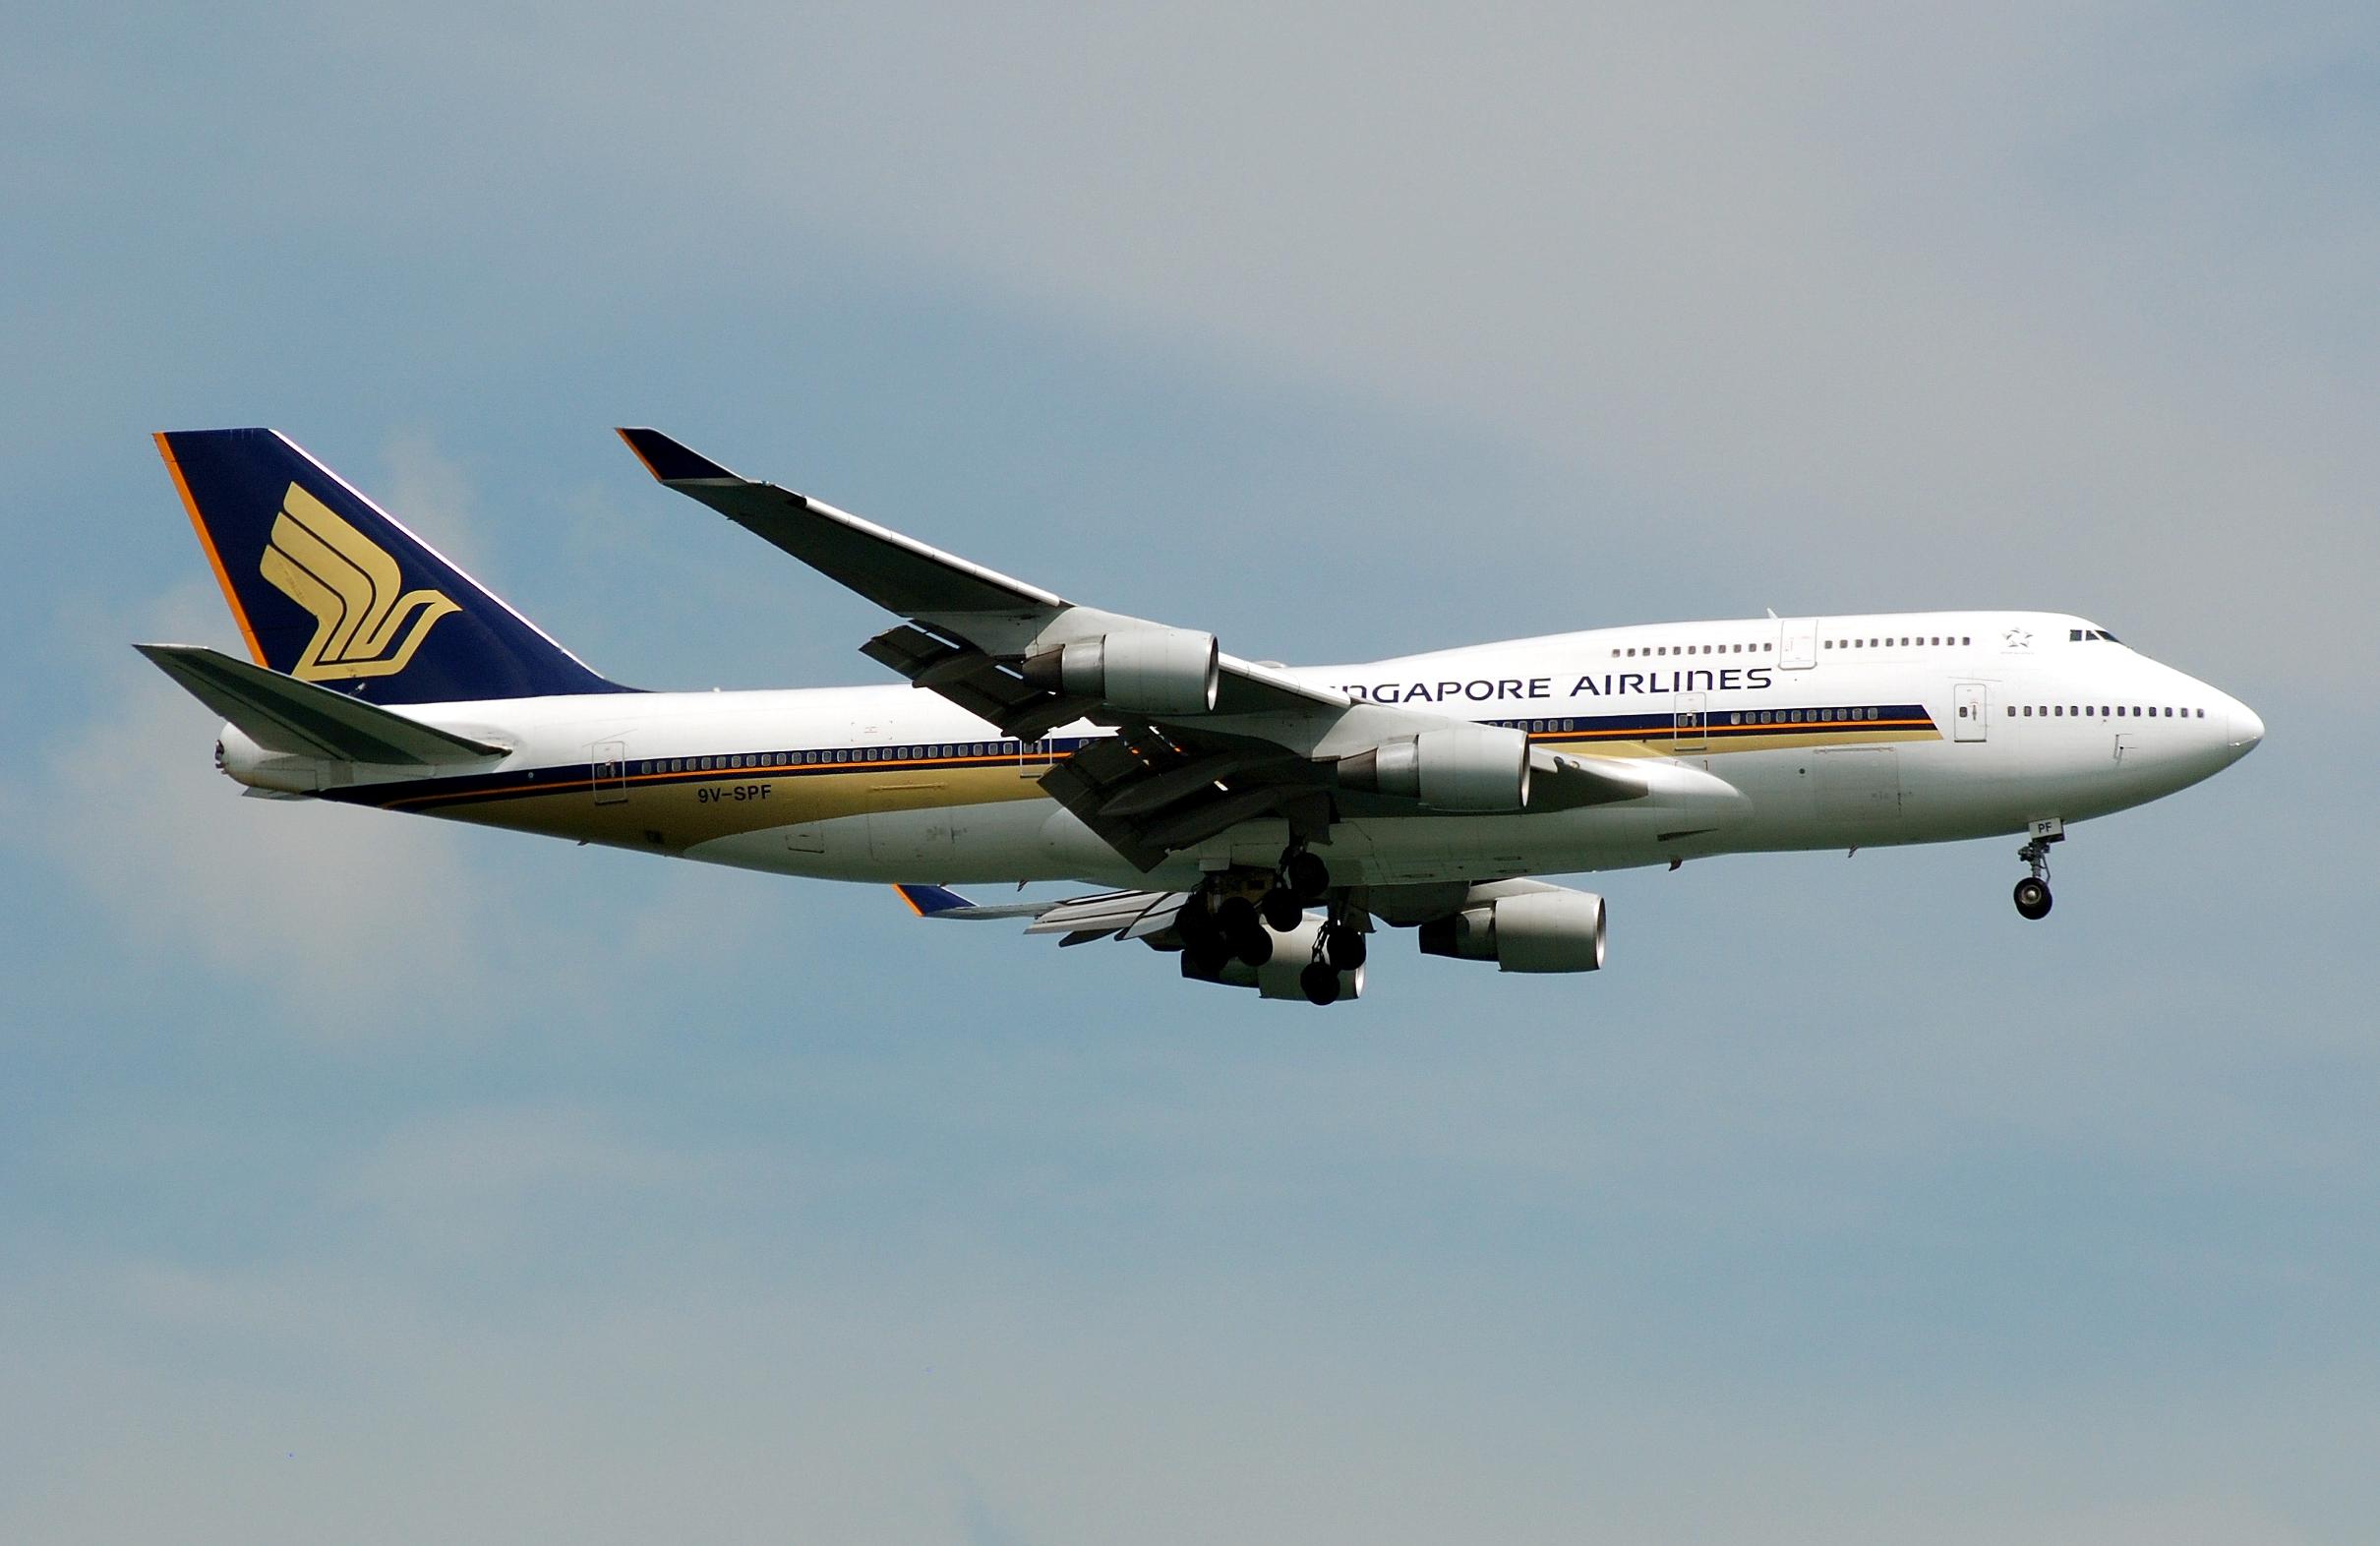 photos of singapore airport